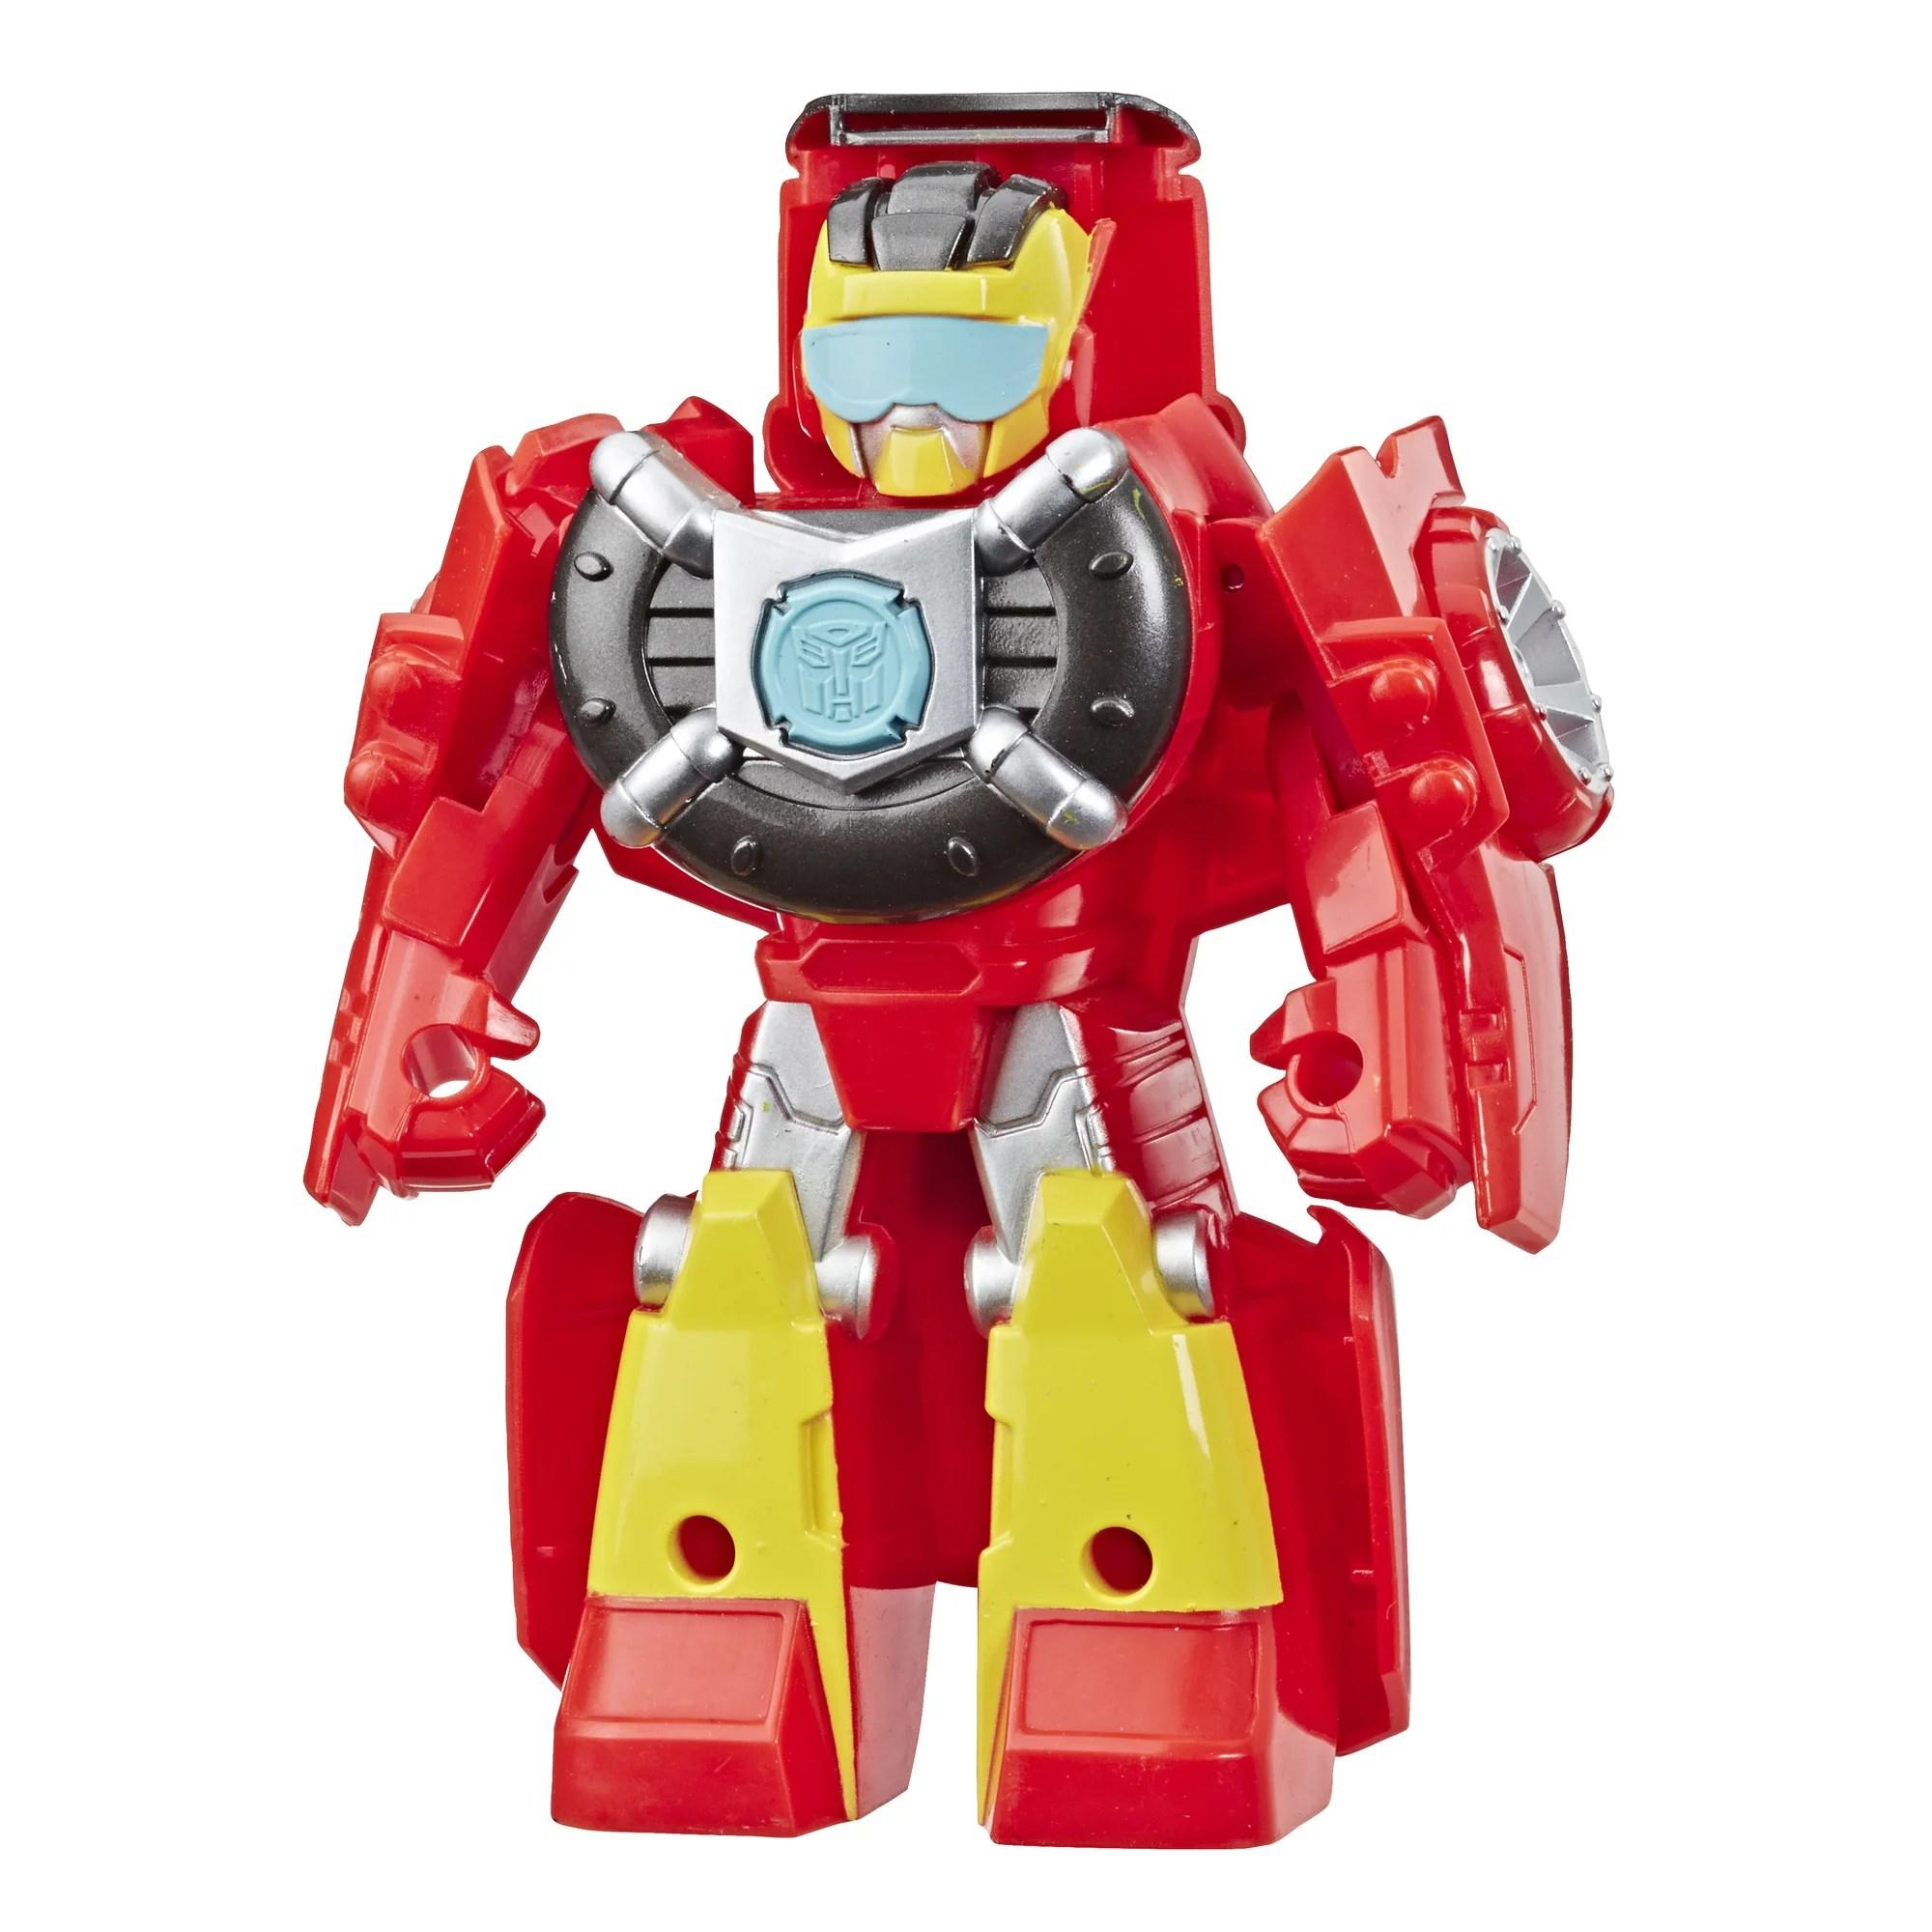 Playskool Heroes Transformers Rescue Bots Academy Hot Shot Walmart Com Walmart Com